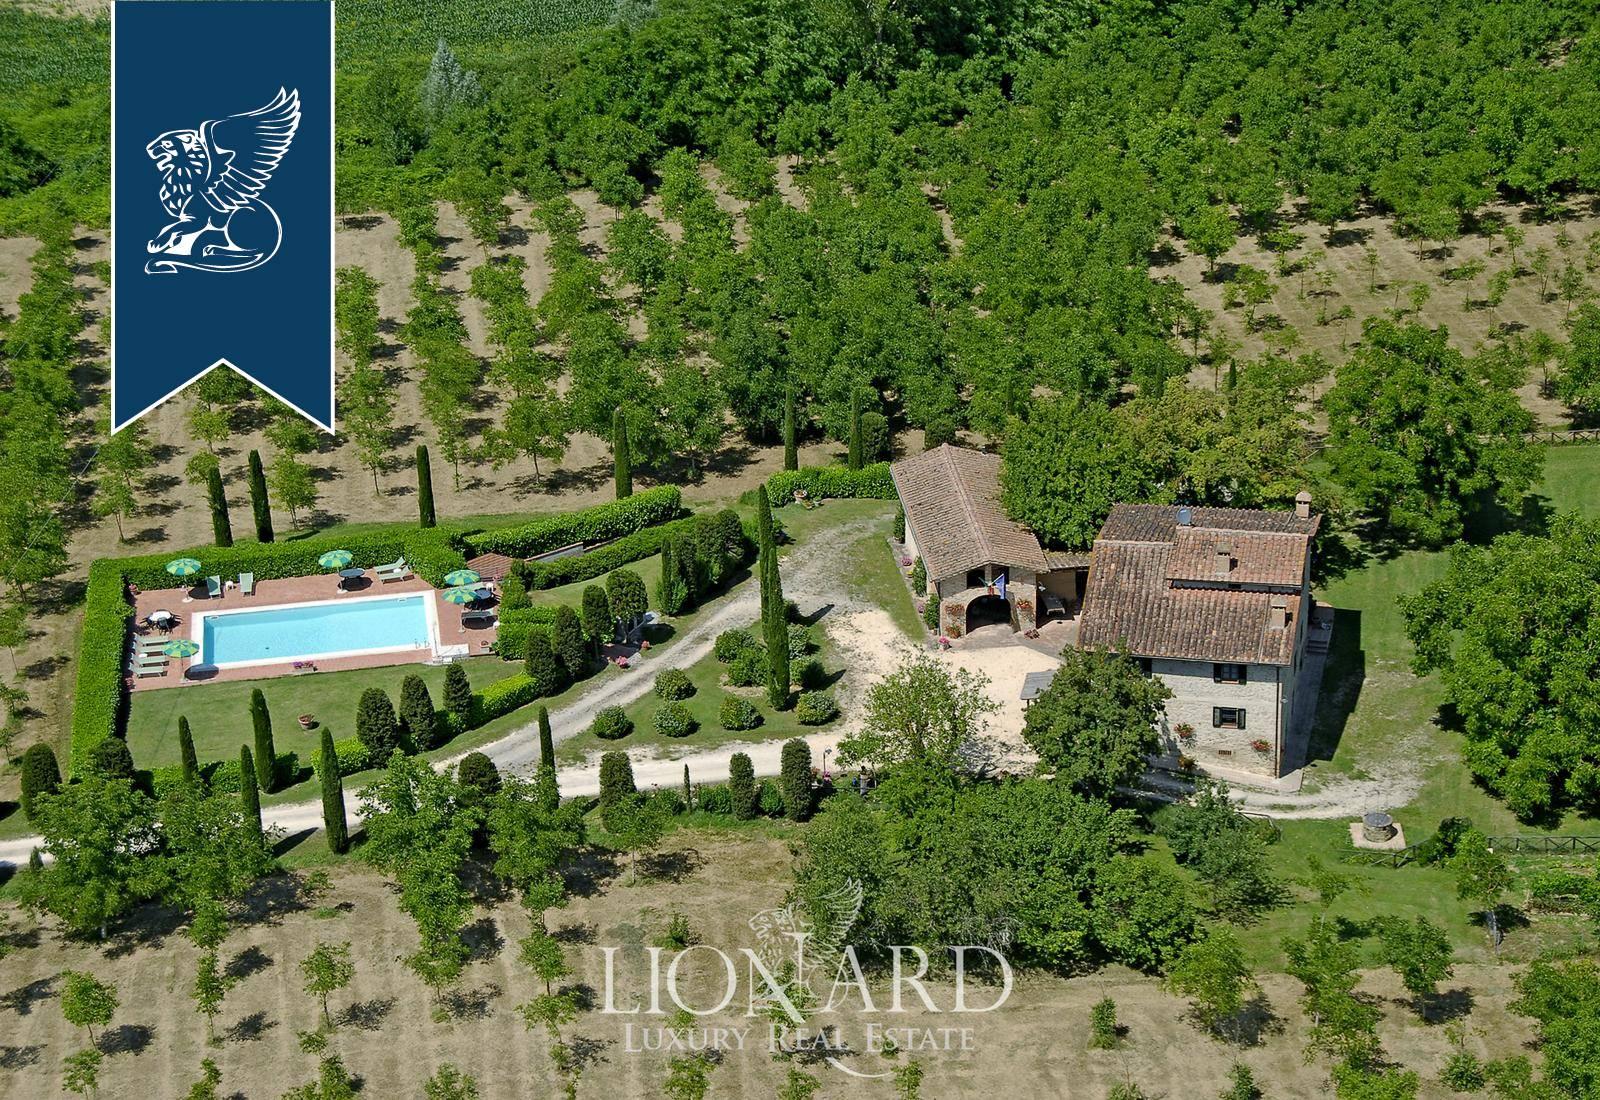 Agriturismo in Vendita a San Gimignano: 0 locali, 420 mq - Foto 3